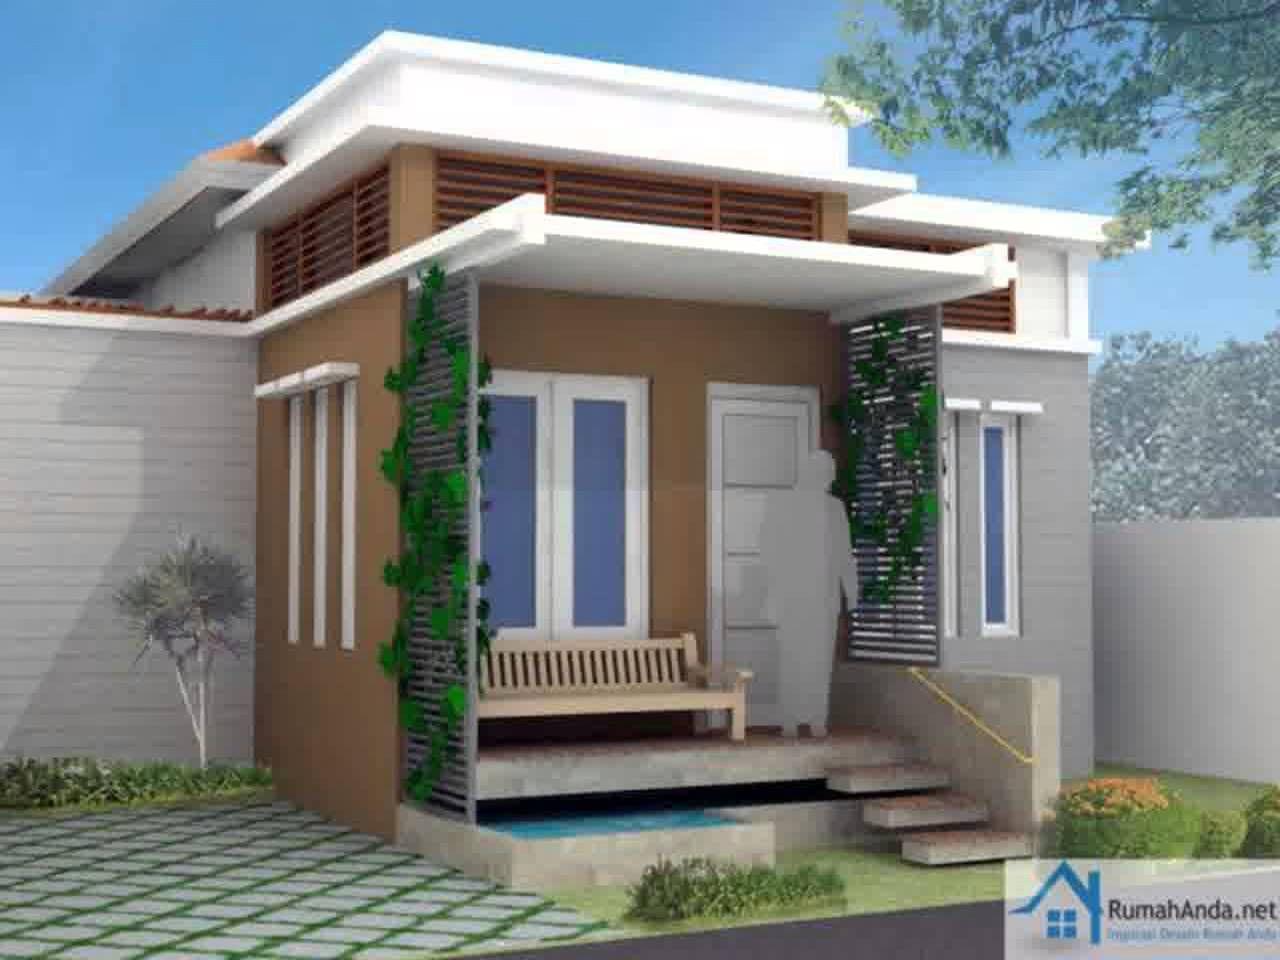 21 Gambar Rumah Minimalis Gaya Eropa Warna Eksterior Rumah Desain Rumah Rumah Minimalis